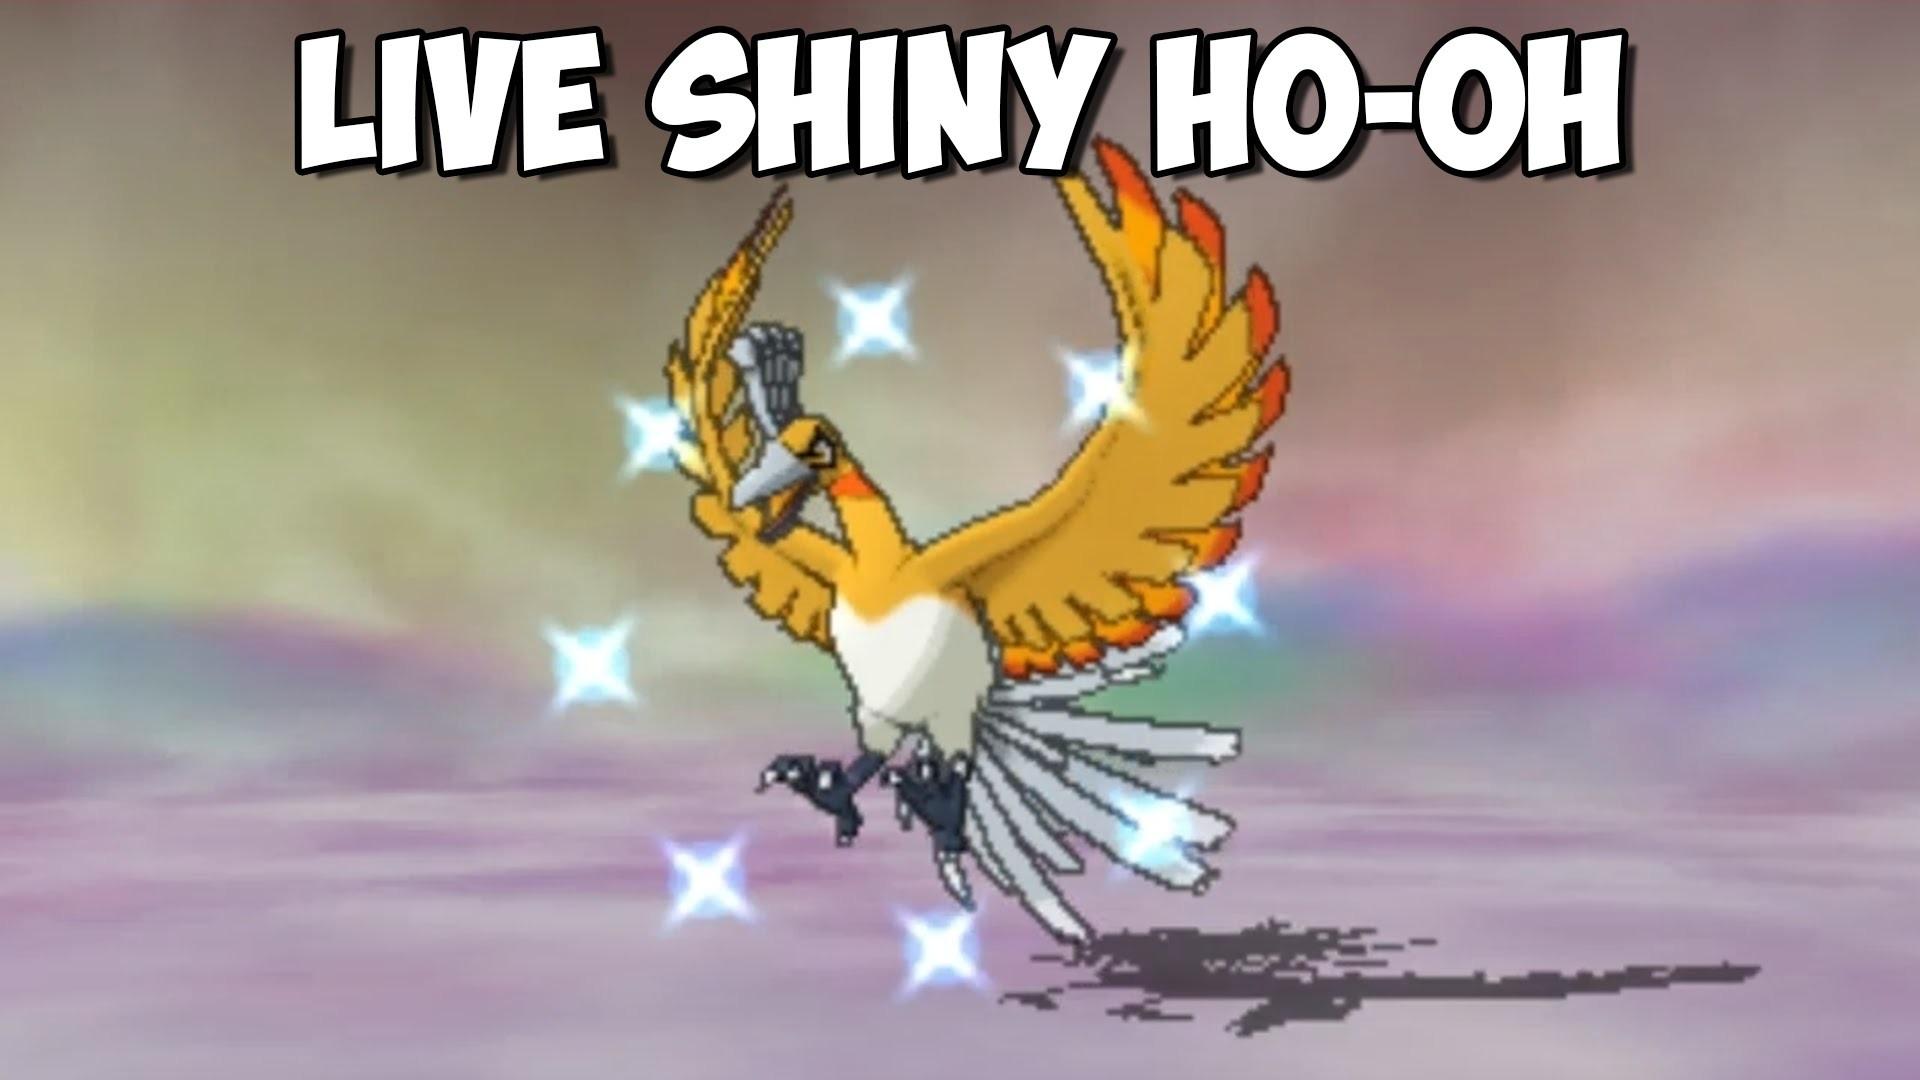 LIVE SHINY HO-OH AFTER 554 SOFT RESETS – Pokemon Omega Ruby/Alpha Sapphire  Highlight